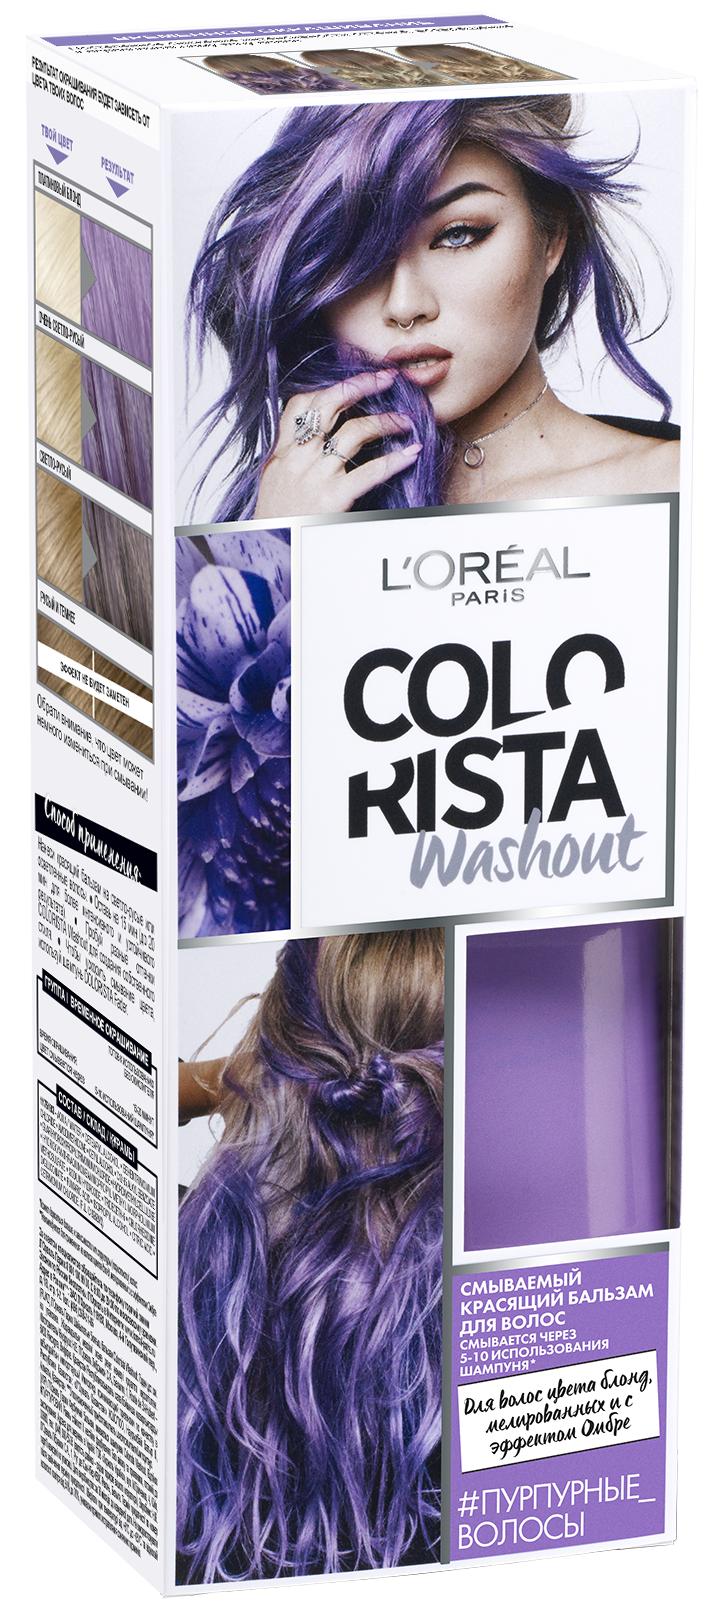 Миниатюра Краска для волос L'Oreal Paris Colorista Washout 05 Purple №1